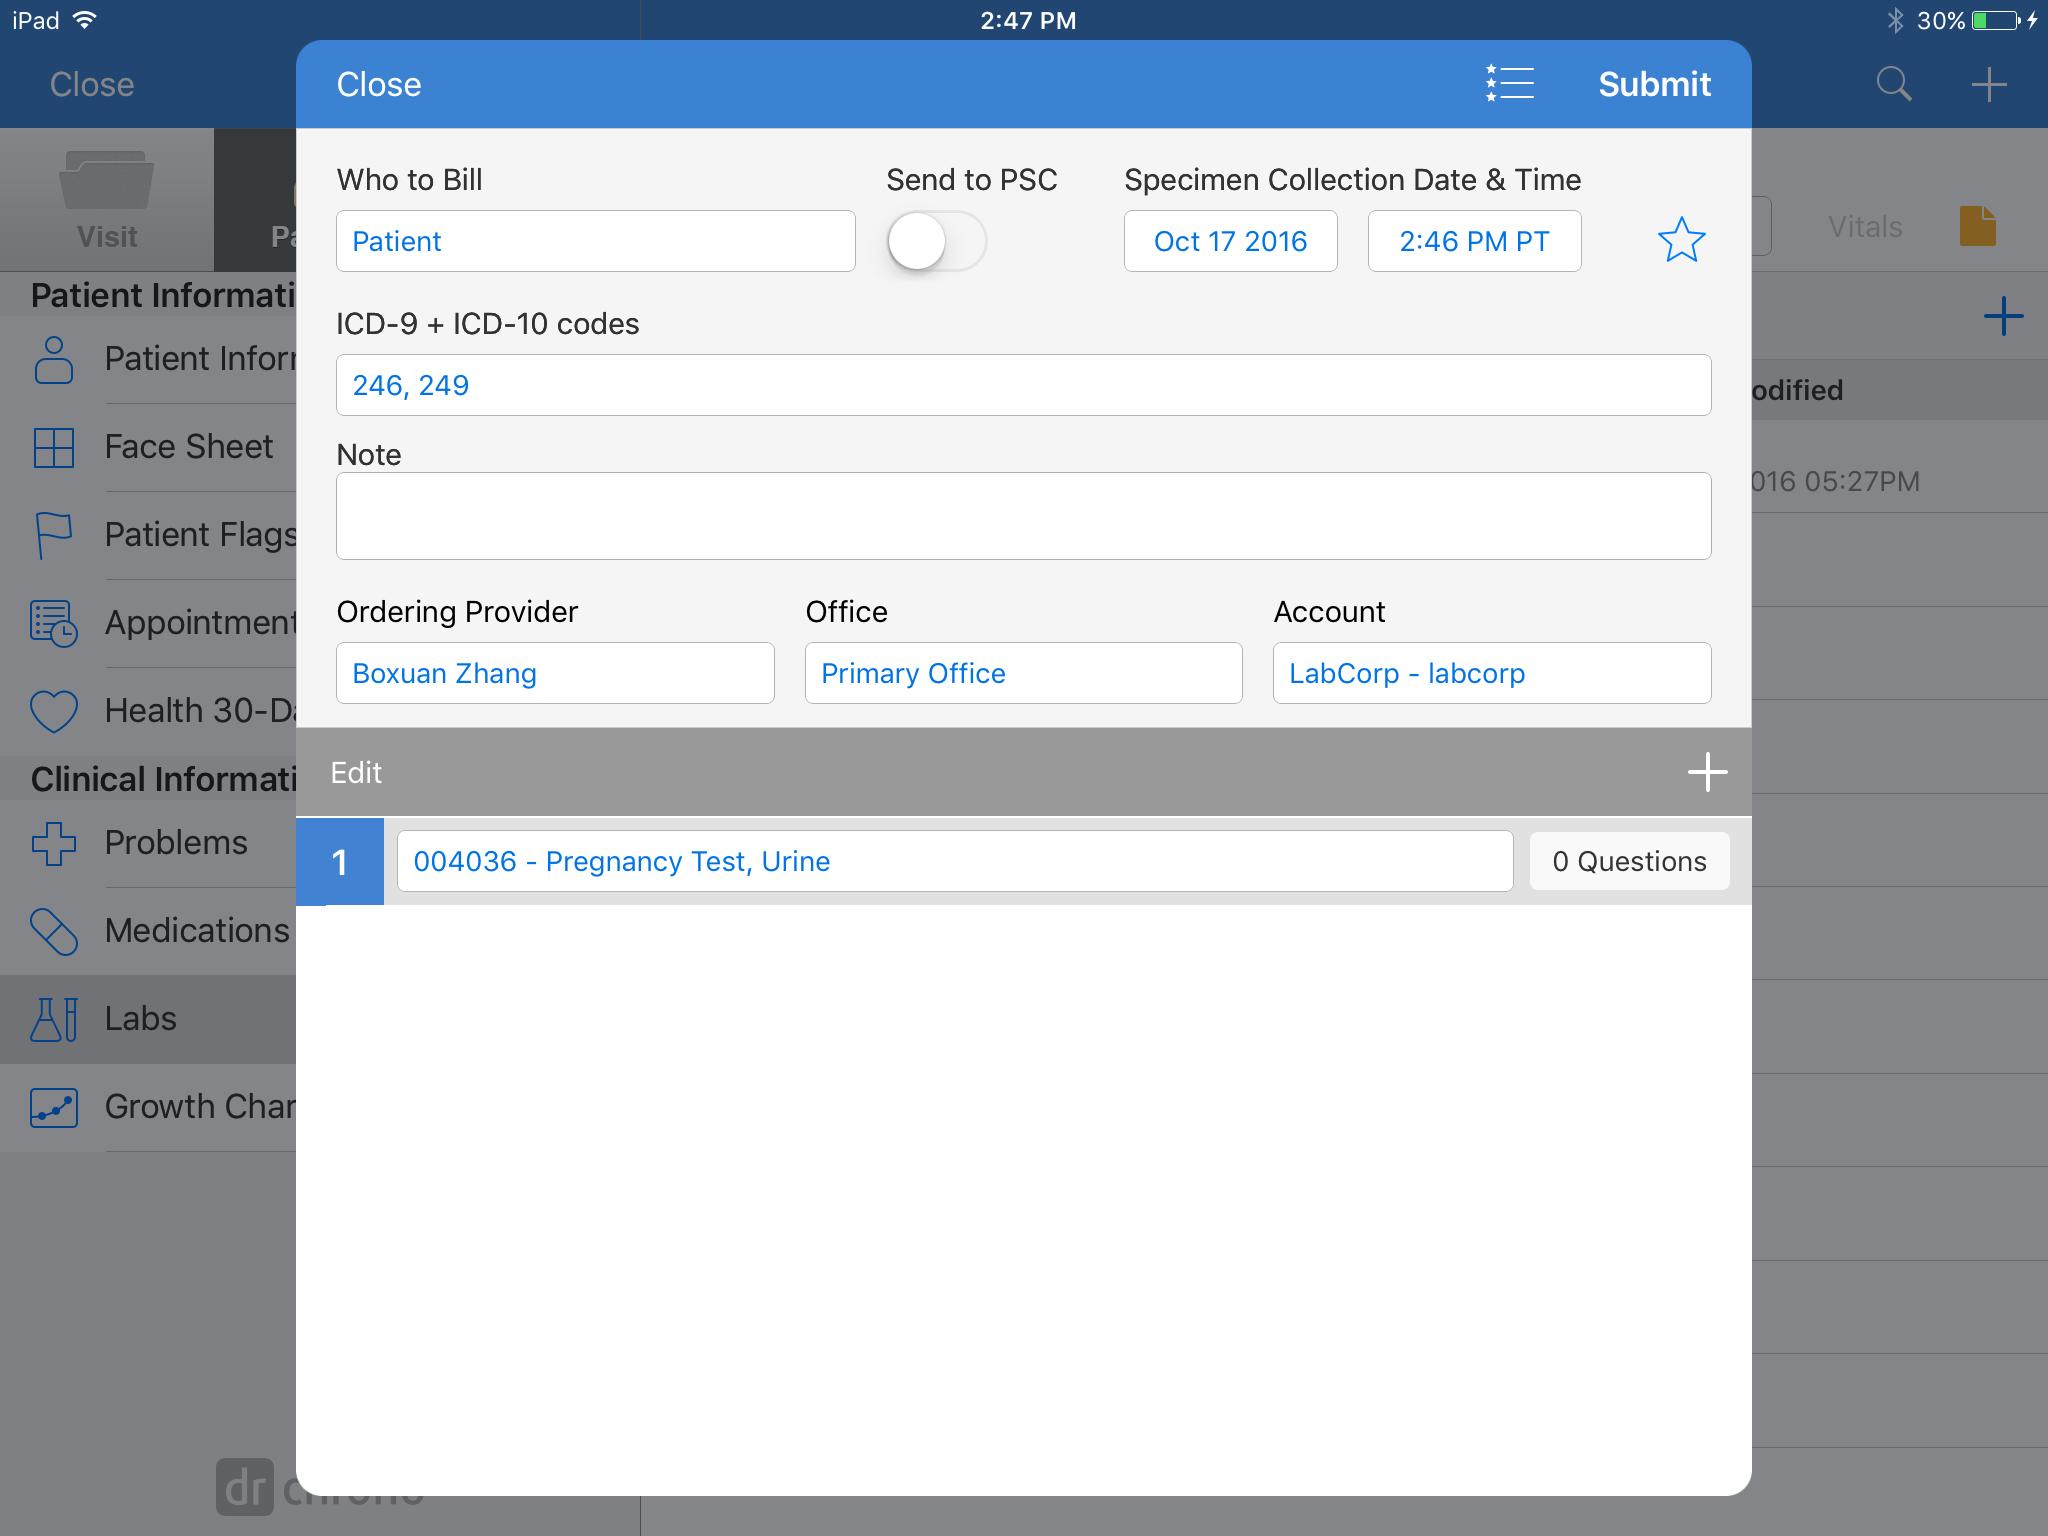 Mobile EHR App: How do I order a lab on my iPad? – drchrono